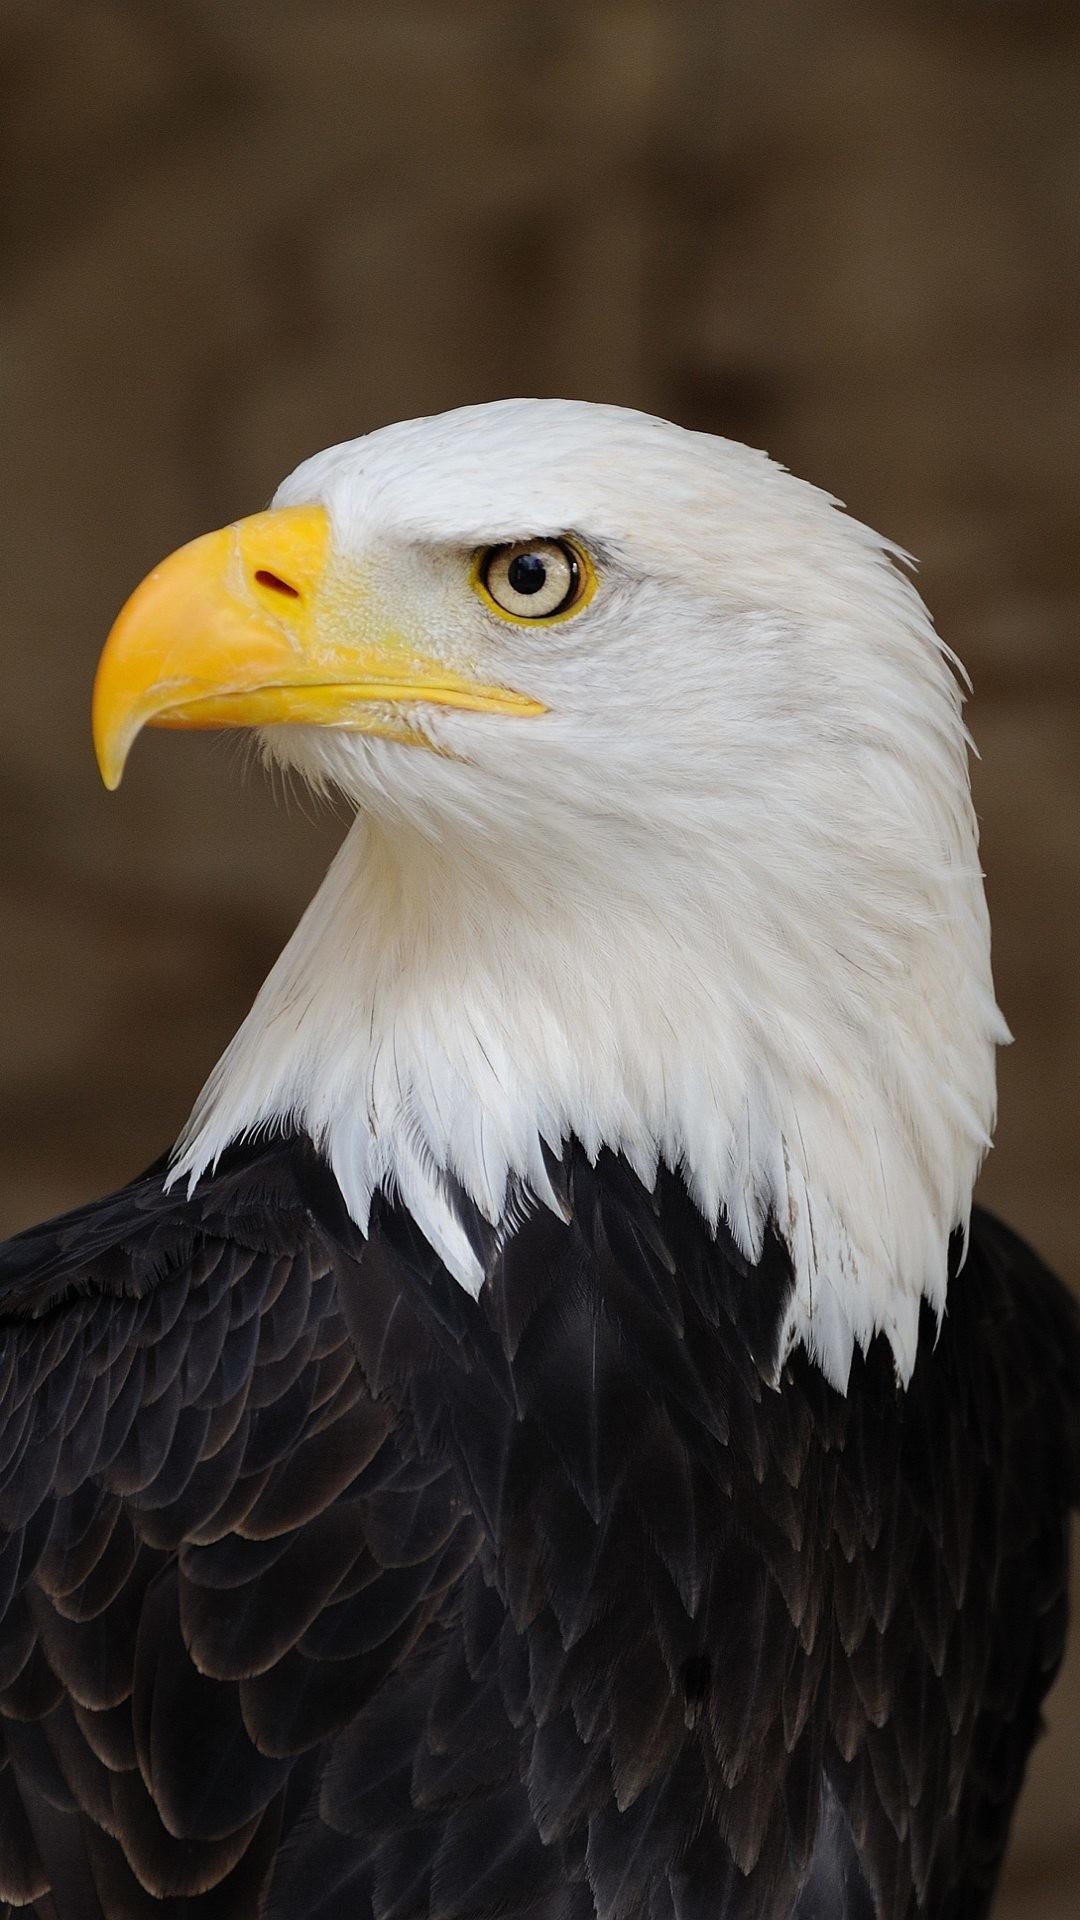 Wallpaper full hd 1080 x 1920 smartphone eagle america symbol